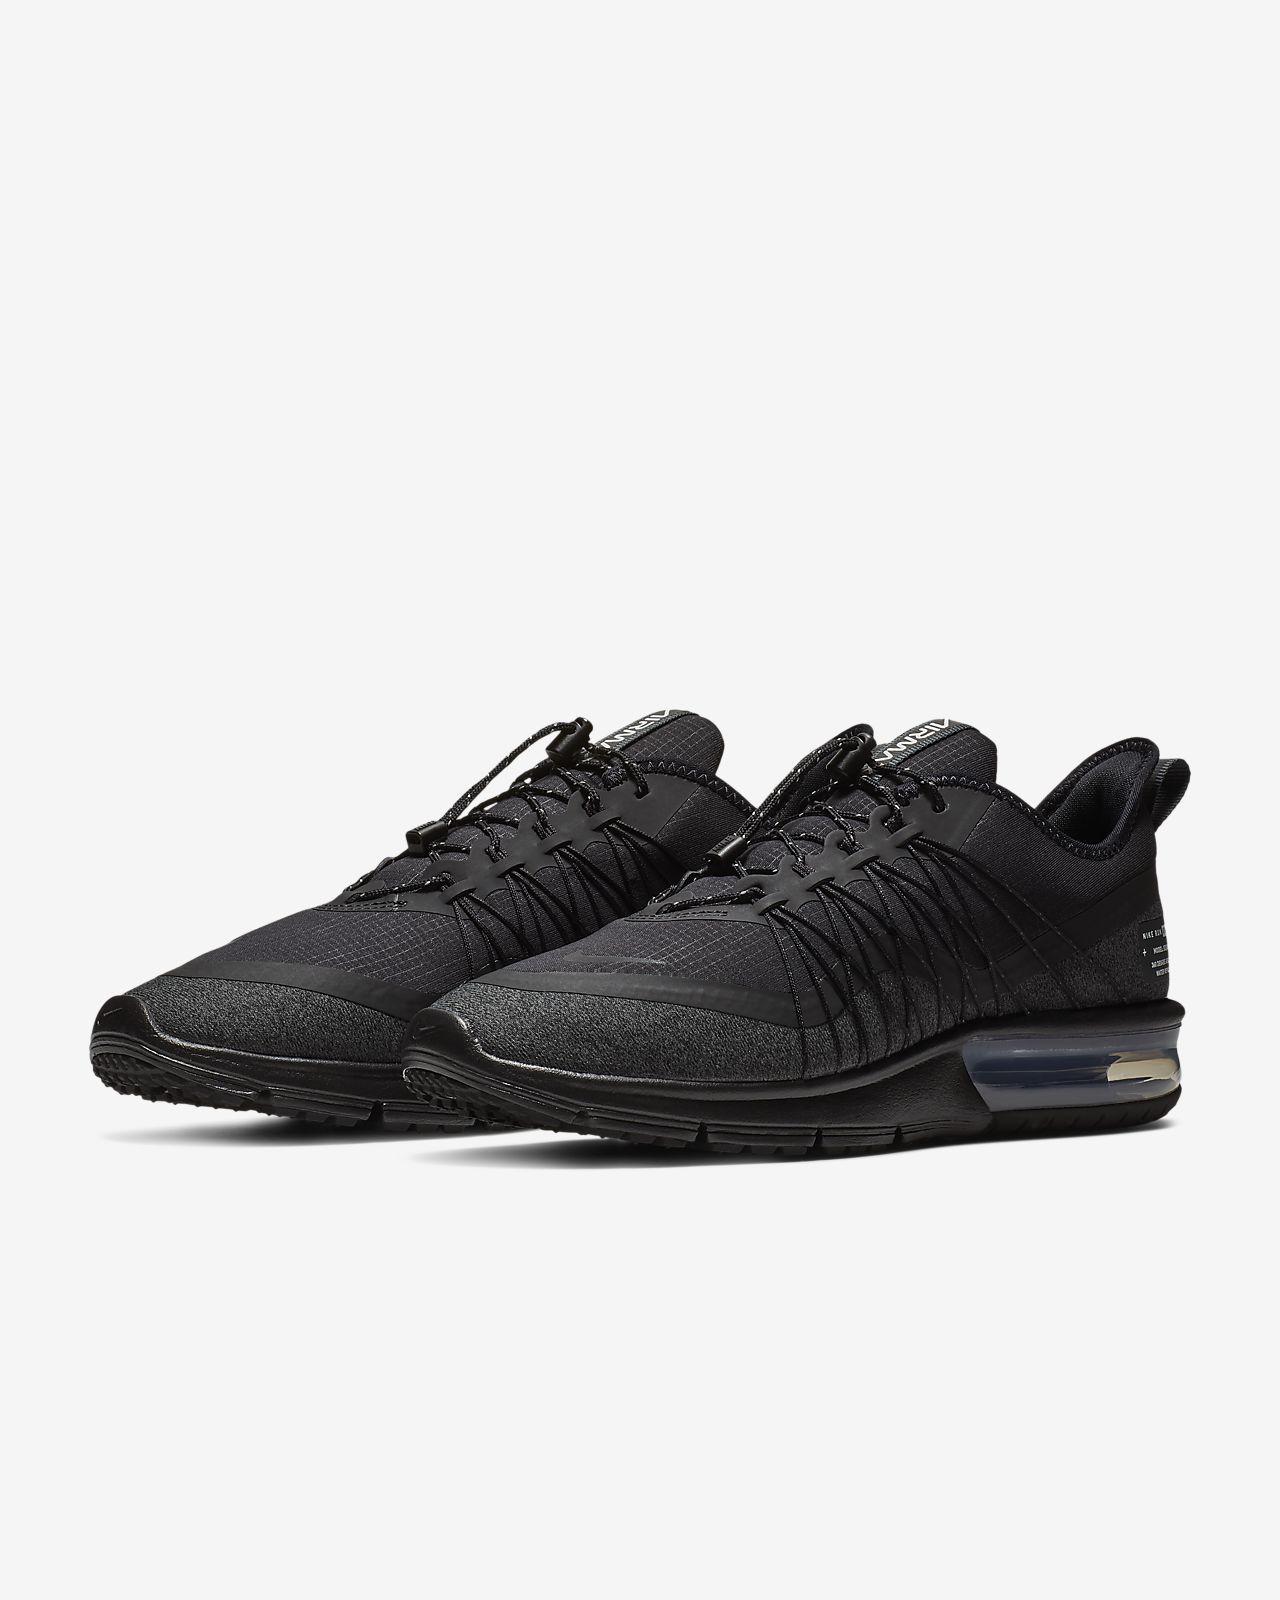 sale retailer 8977b 3483e ... Nike Air Max Sequent 4 Utility Womens Shoe